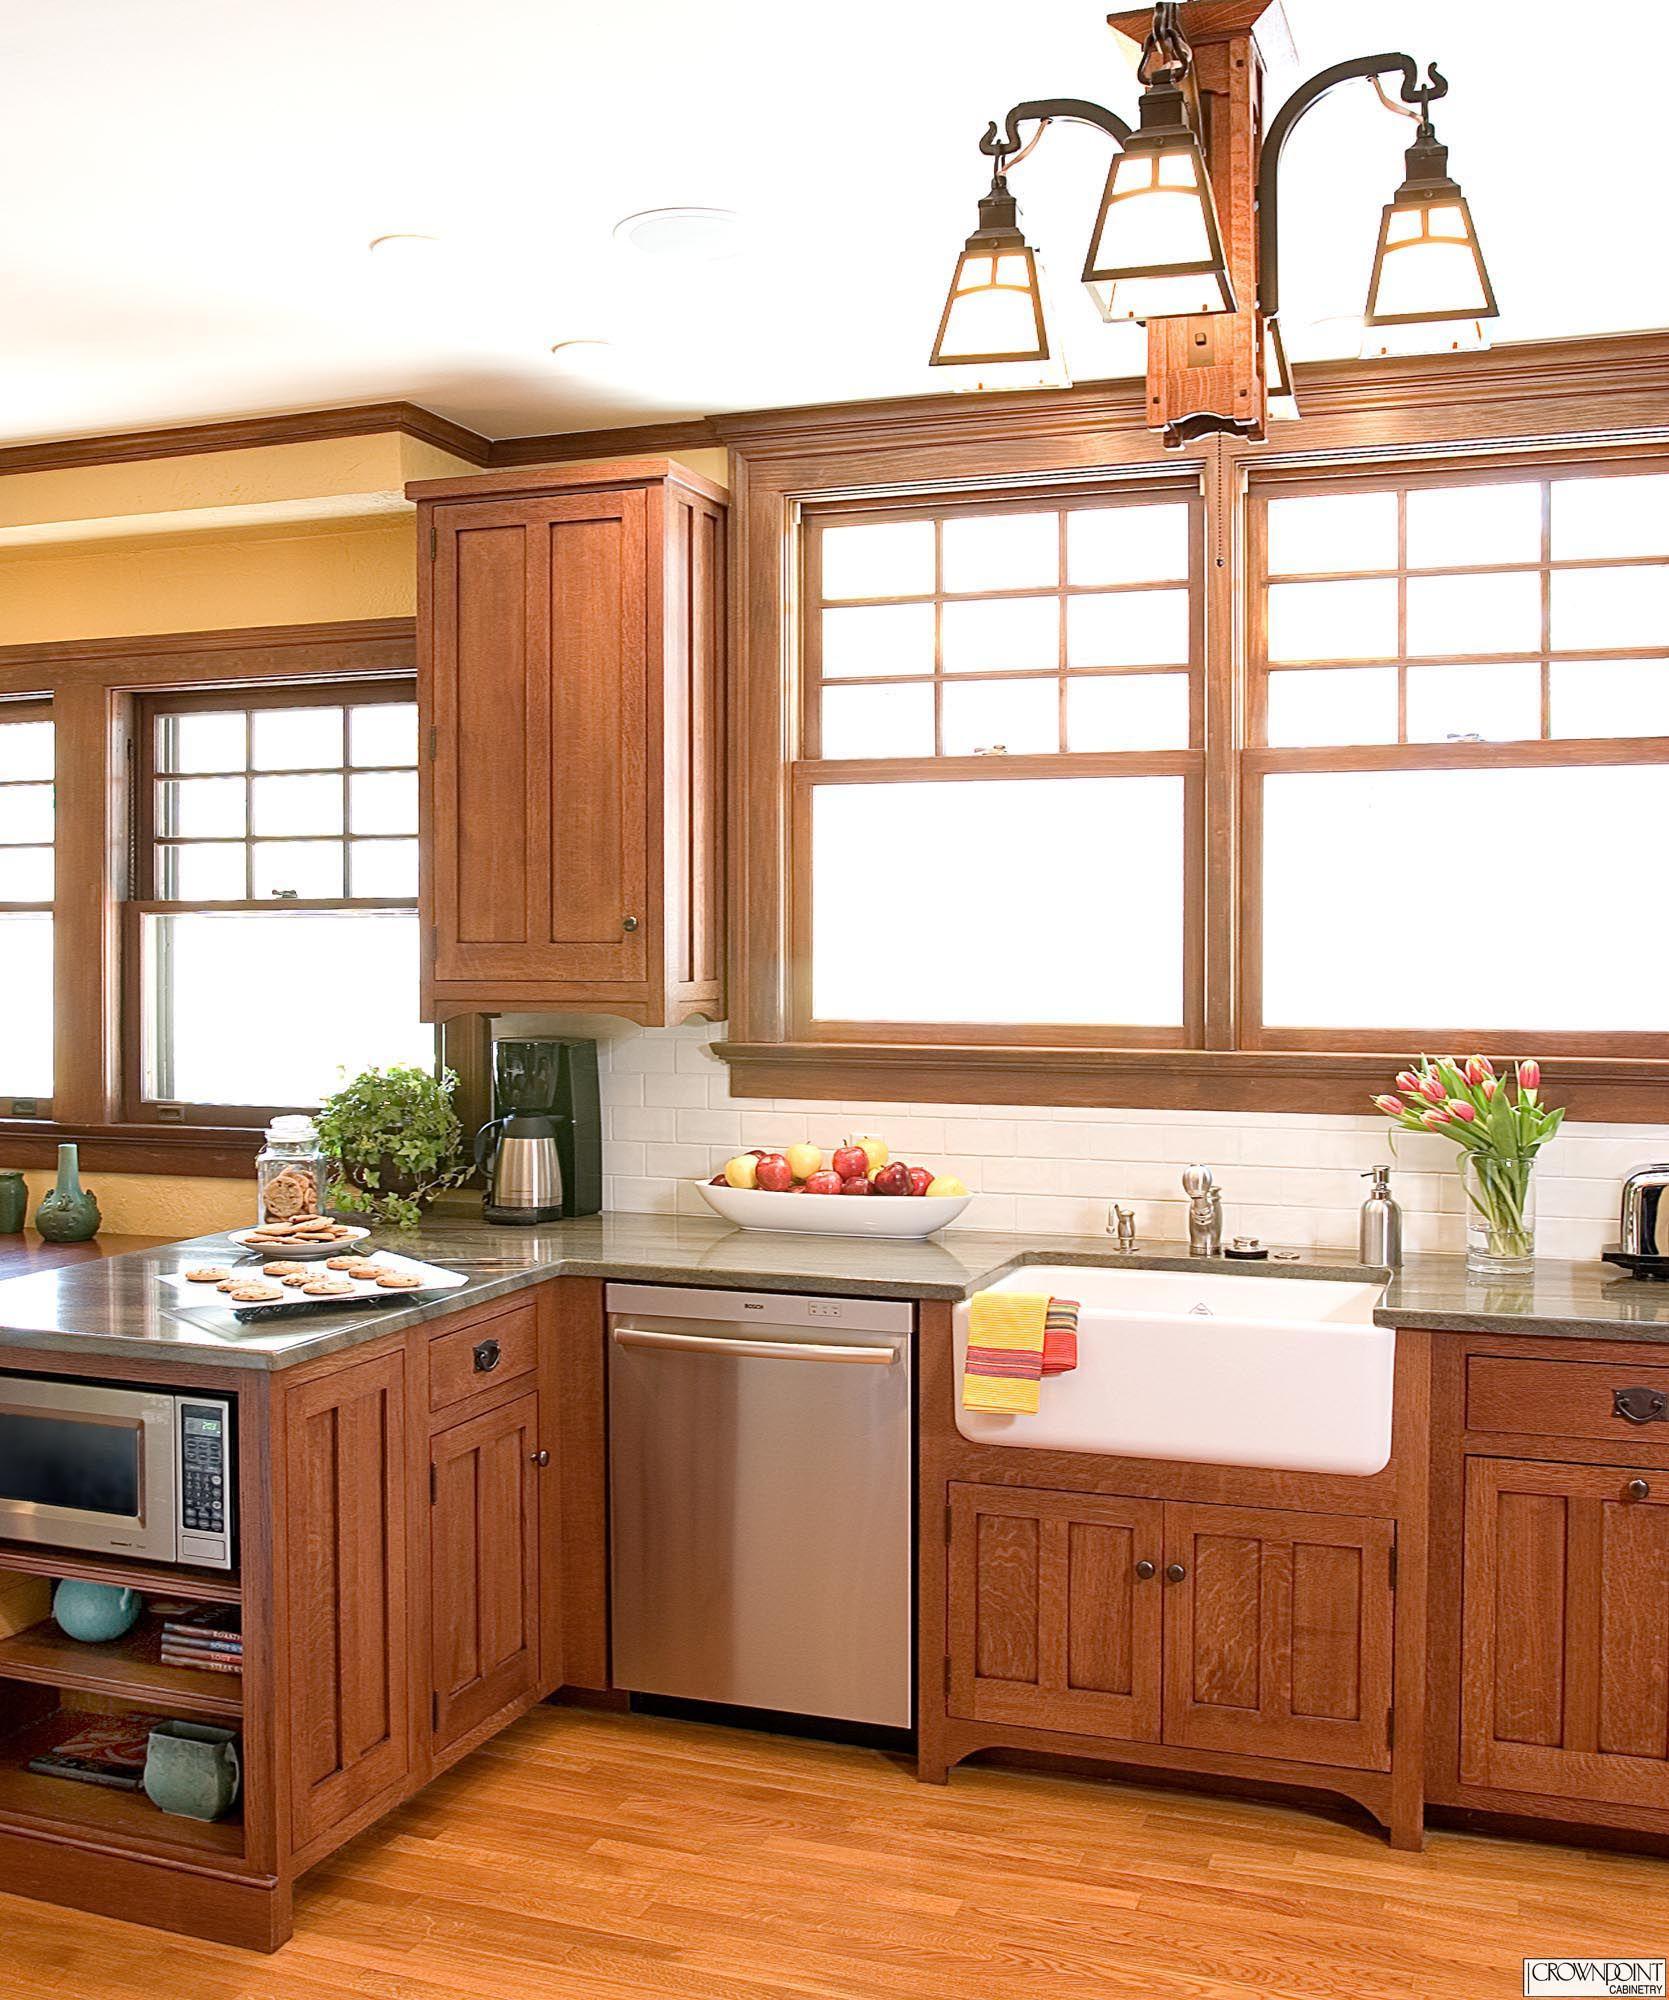 G my home pinterest kitchens